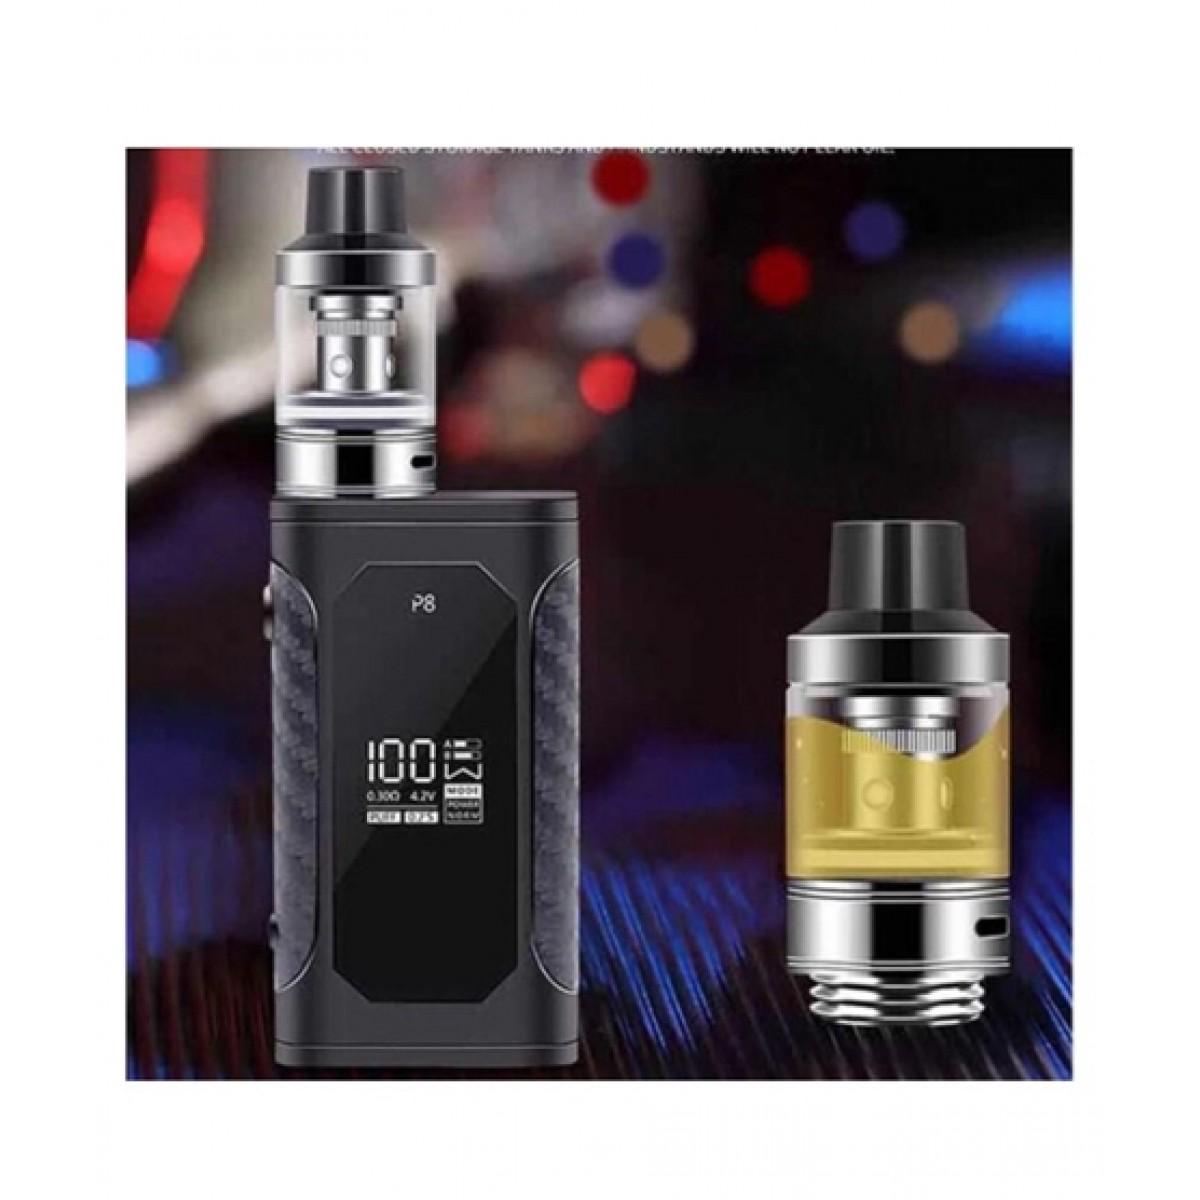 Muzamil Store Vaporizer Kit Vape Mod 100W Electronic Cigarette